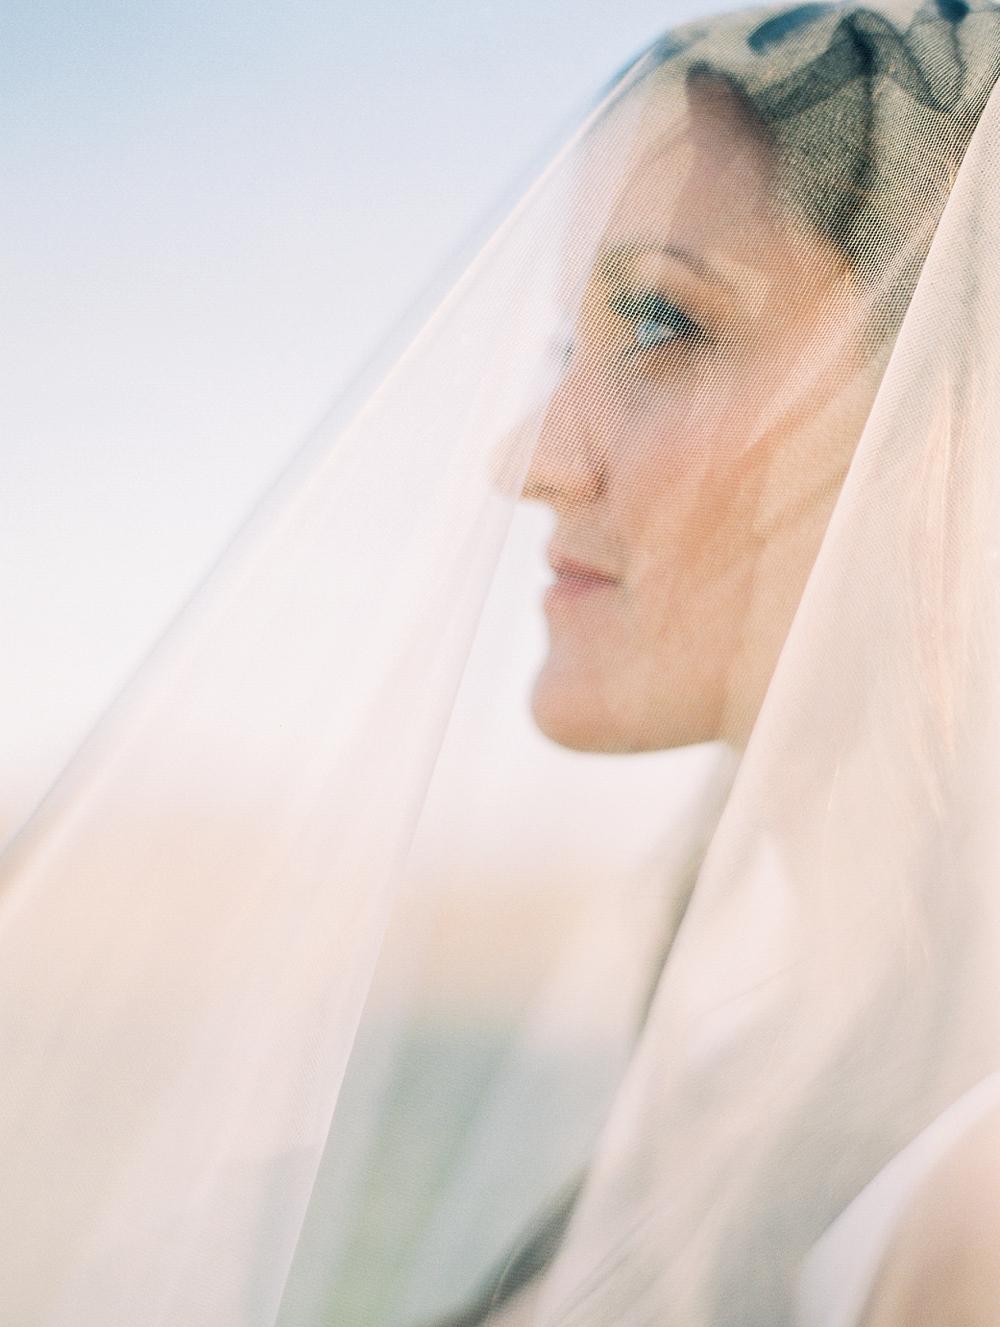 Kristin-La-Voie-Photography-austin-houston-texas-wedding-photographer-the-oaks-at-high-hill -6